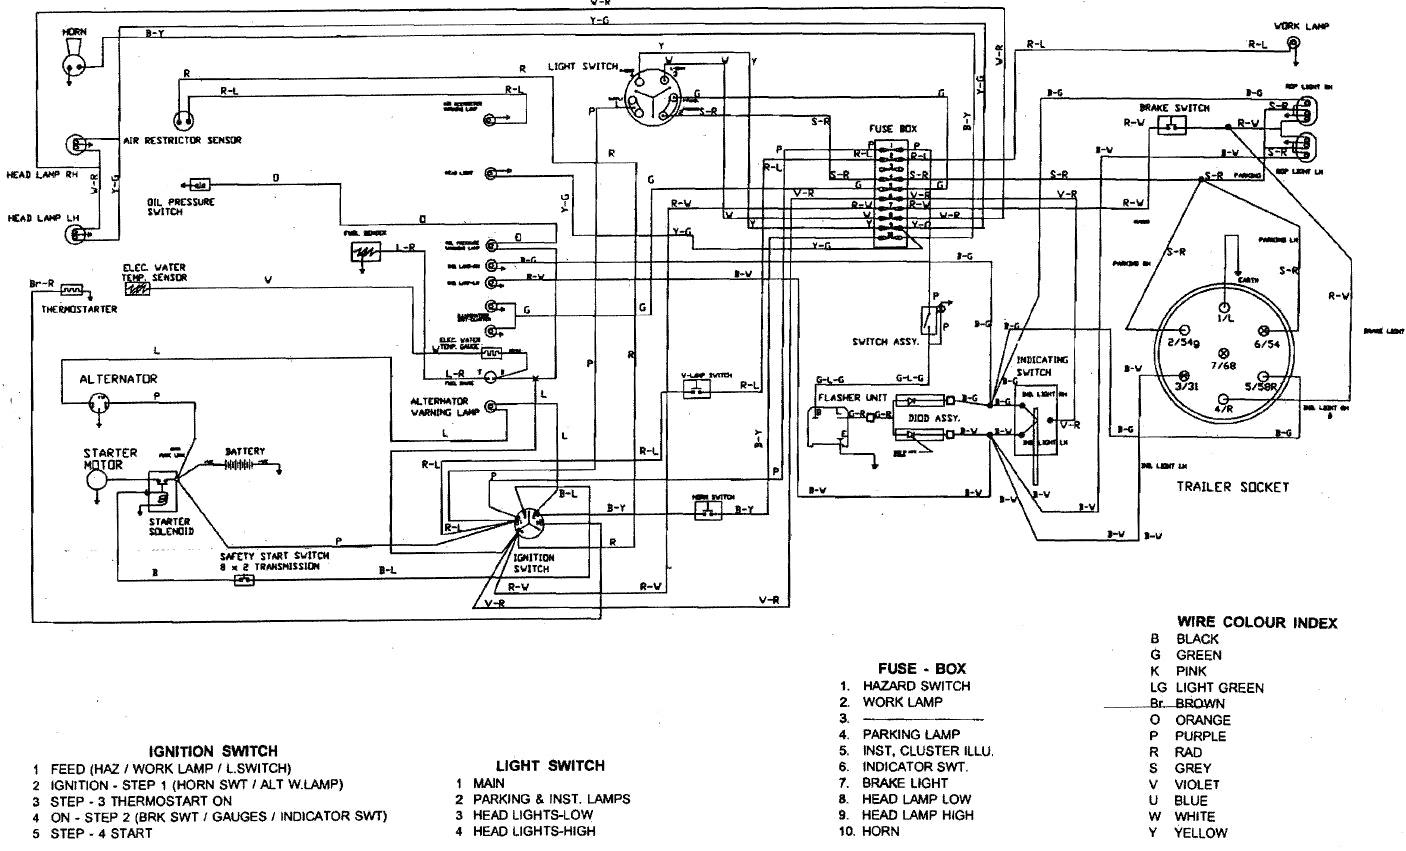 john deere g wiring diagram john deere 2630 wiring diagram wiring diagram data  john deere 2630 wiring diagram wiring